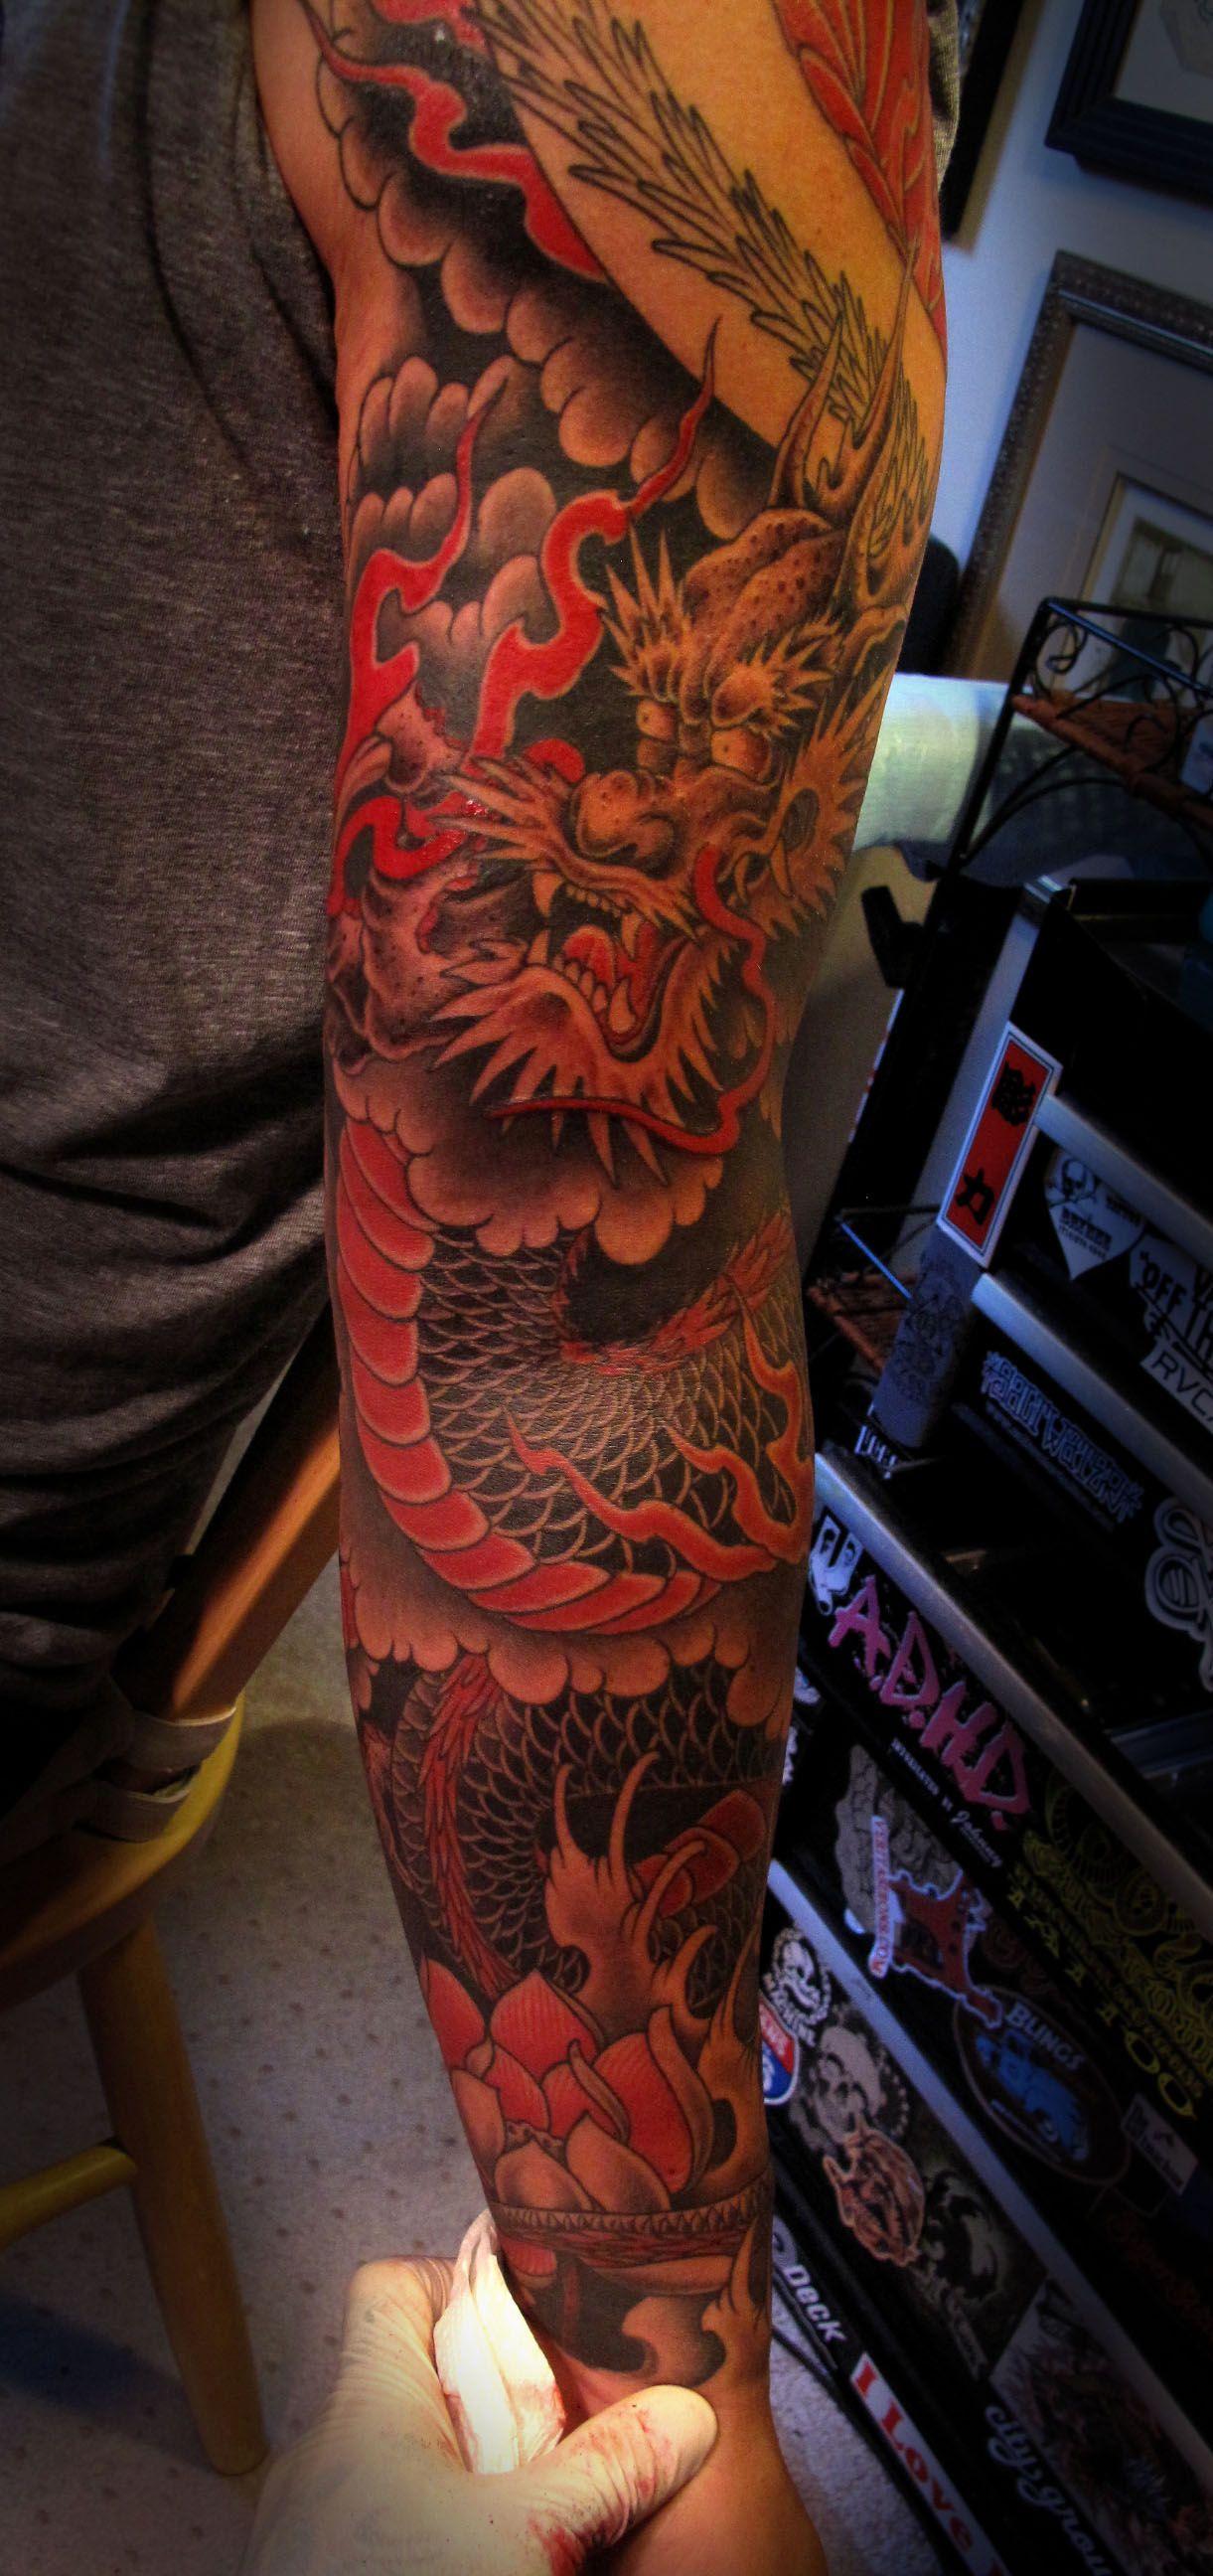 45 amazing japanese tattoo designs tattoo easily - Japanese Dragon Sleeve Tattoo Google Search